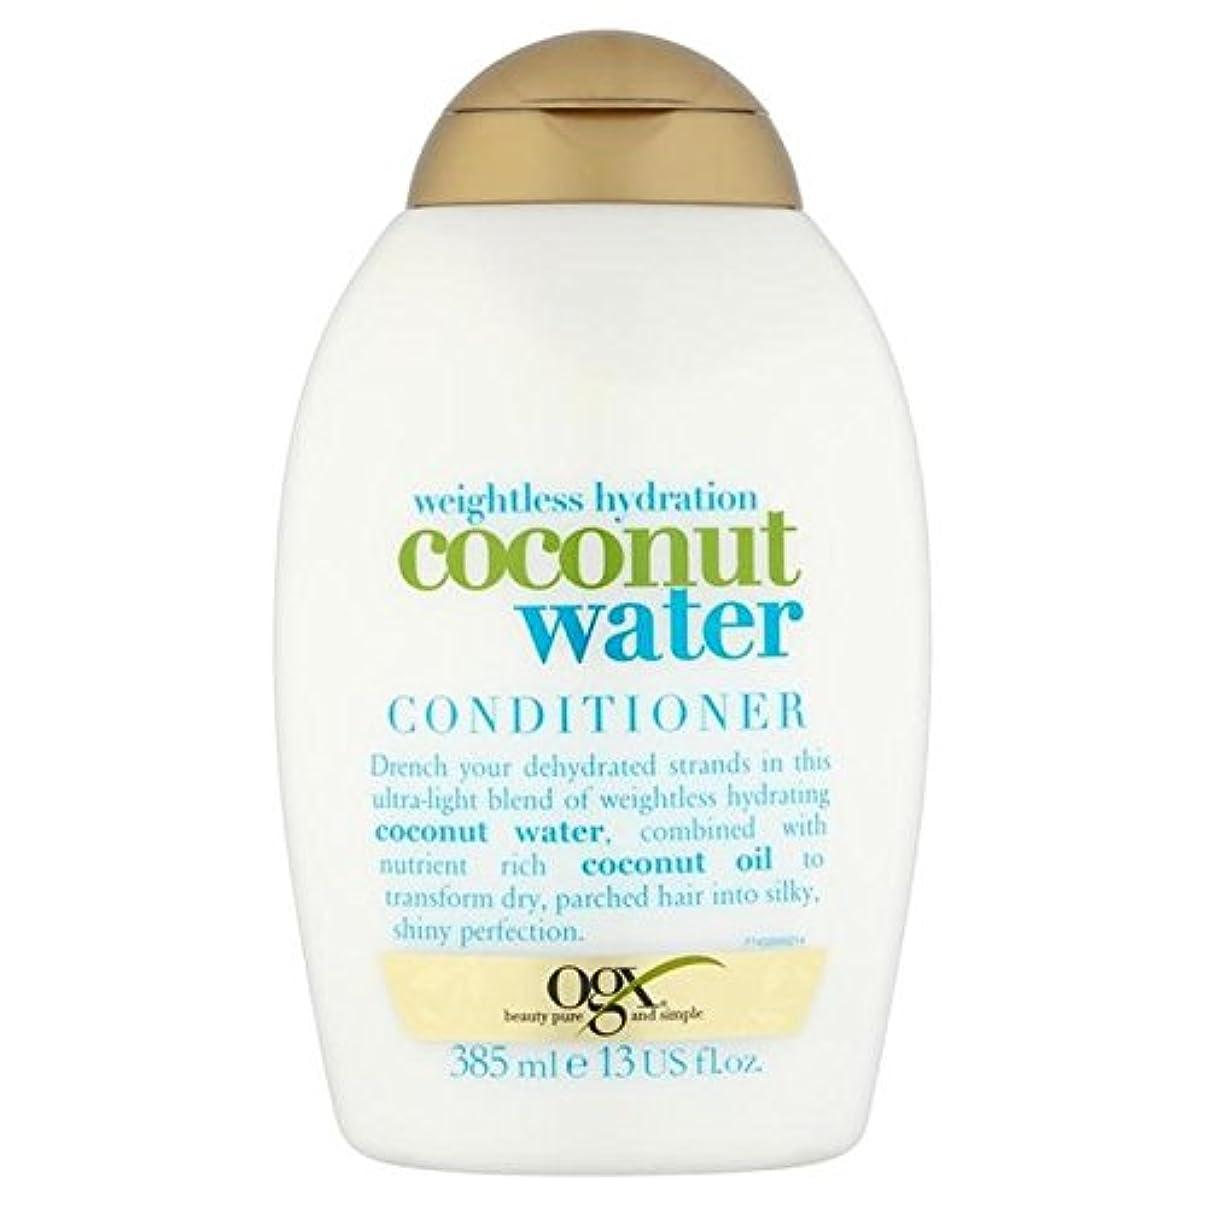 Ogx Coconut Water Conditioner 385ml - ココナッツ水コンディショナー385ミリリットル [並行輸入品]